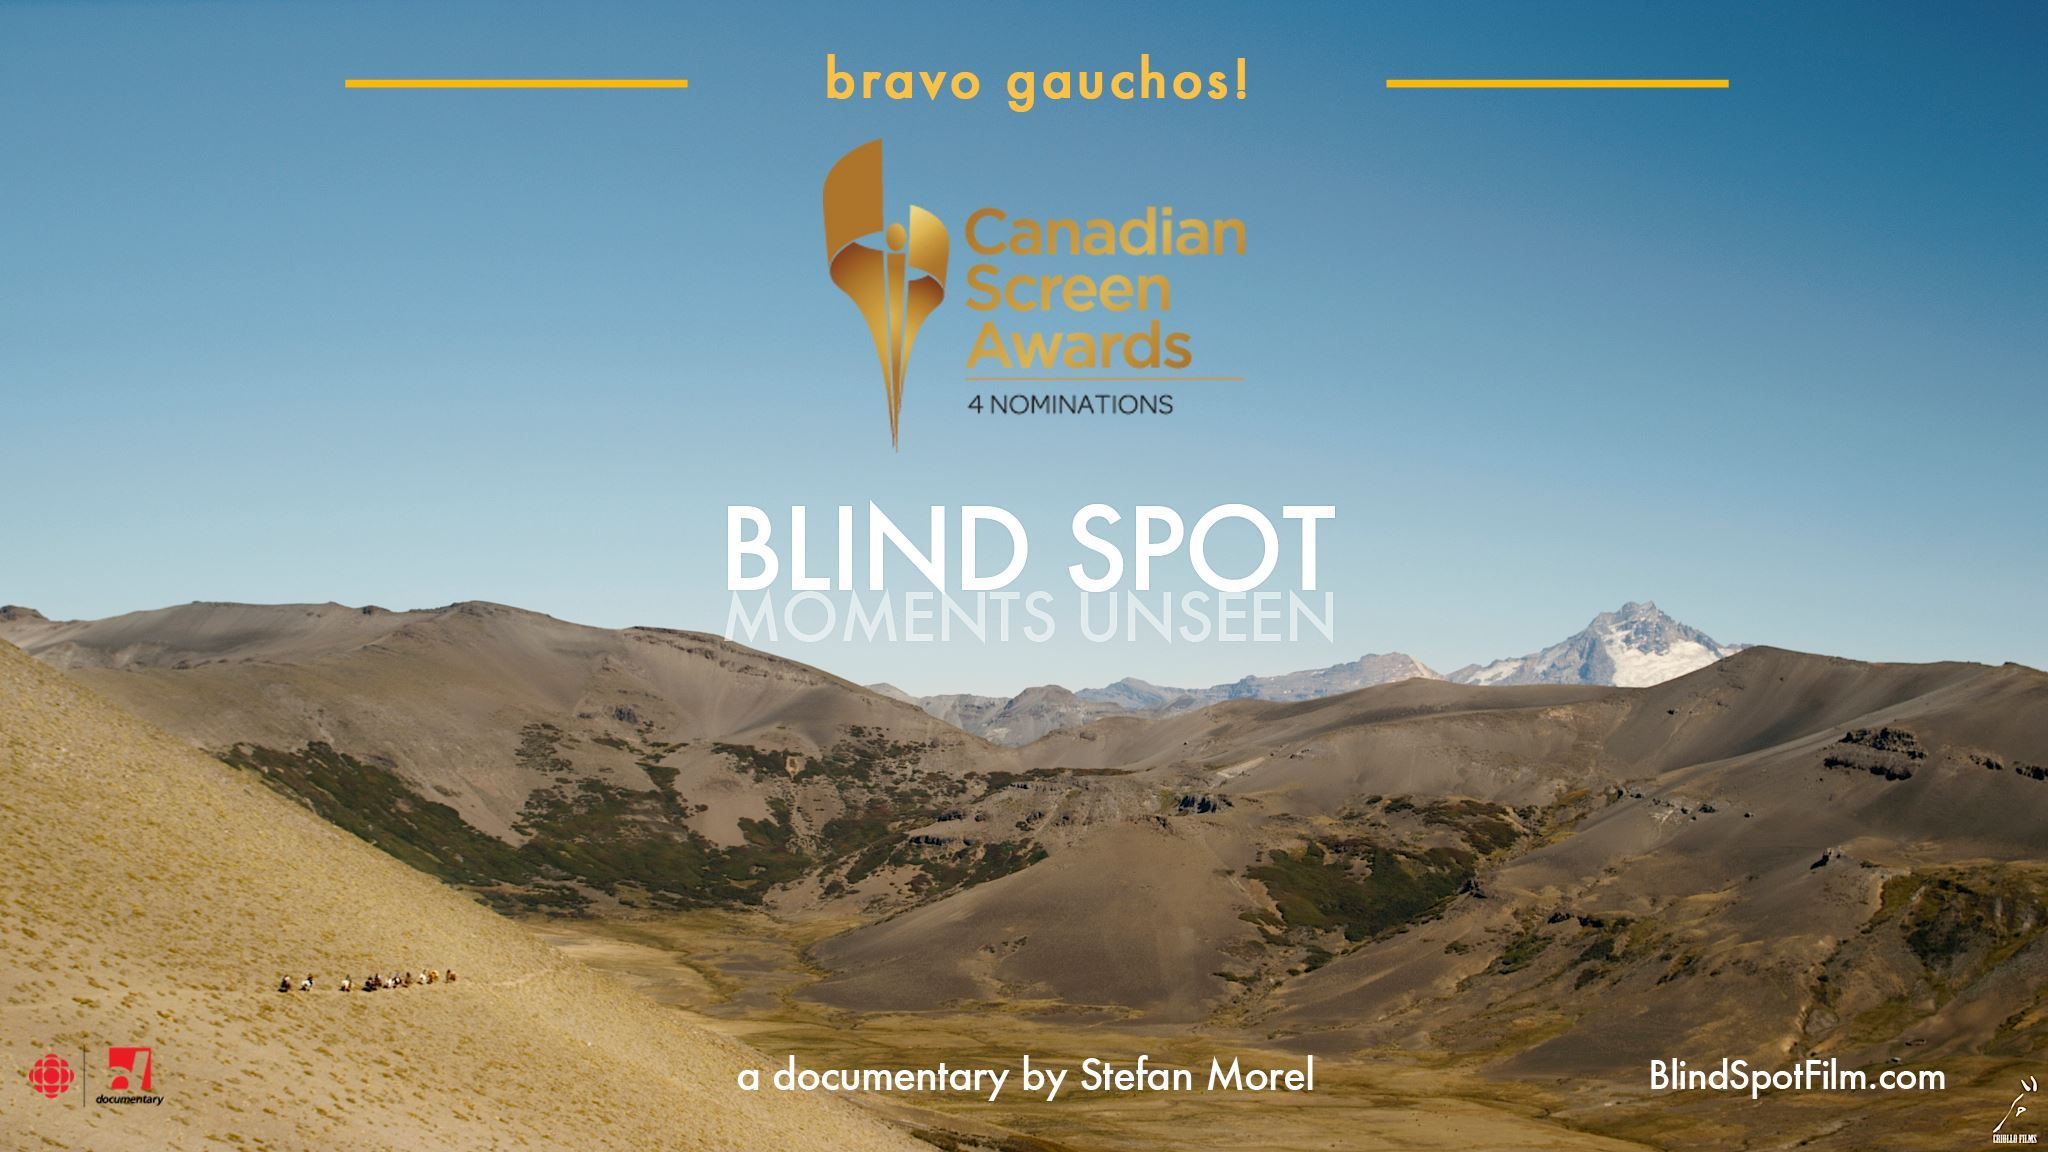 Wednesday  April 6th – Main Theater – 9:00 pm  Blind Spot – Canada  - Documentary – 123 – WINNER  Equestrian Documentary Full – Equestrian International Documentary / 47:08 min / International https://www.facebook.com/BlindSpotMomentsUnseen